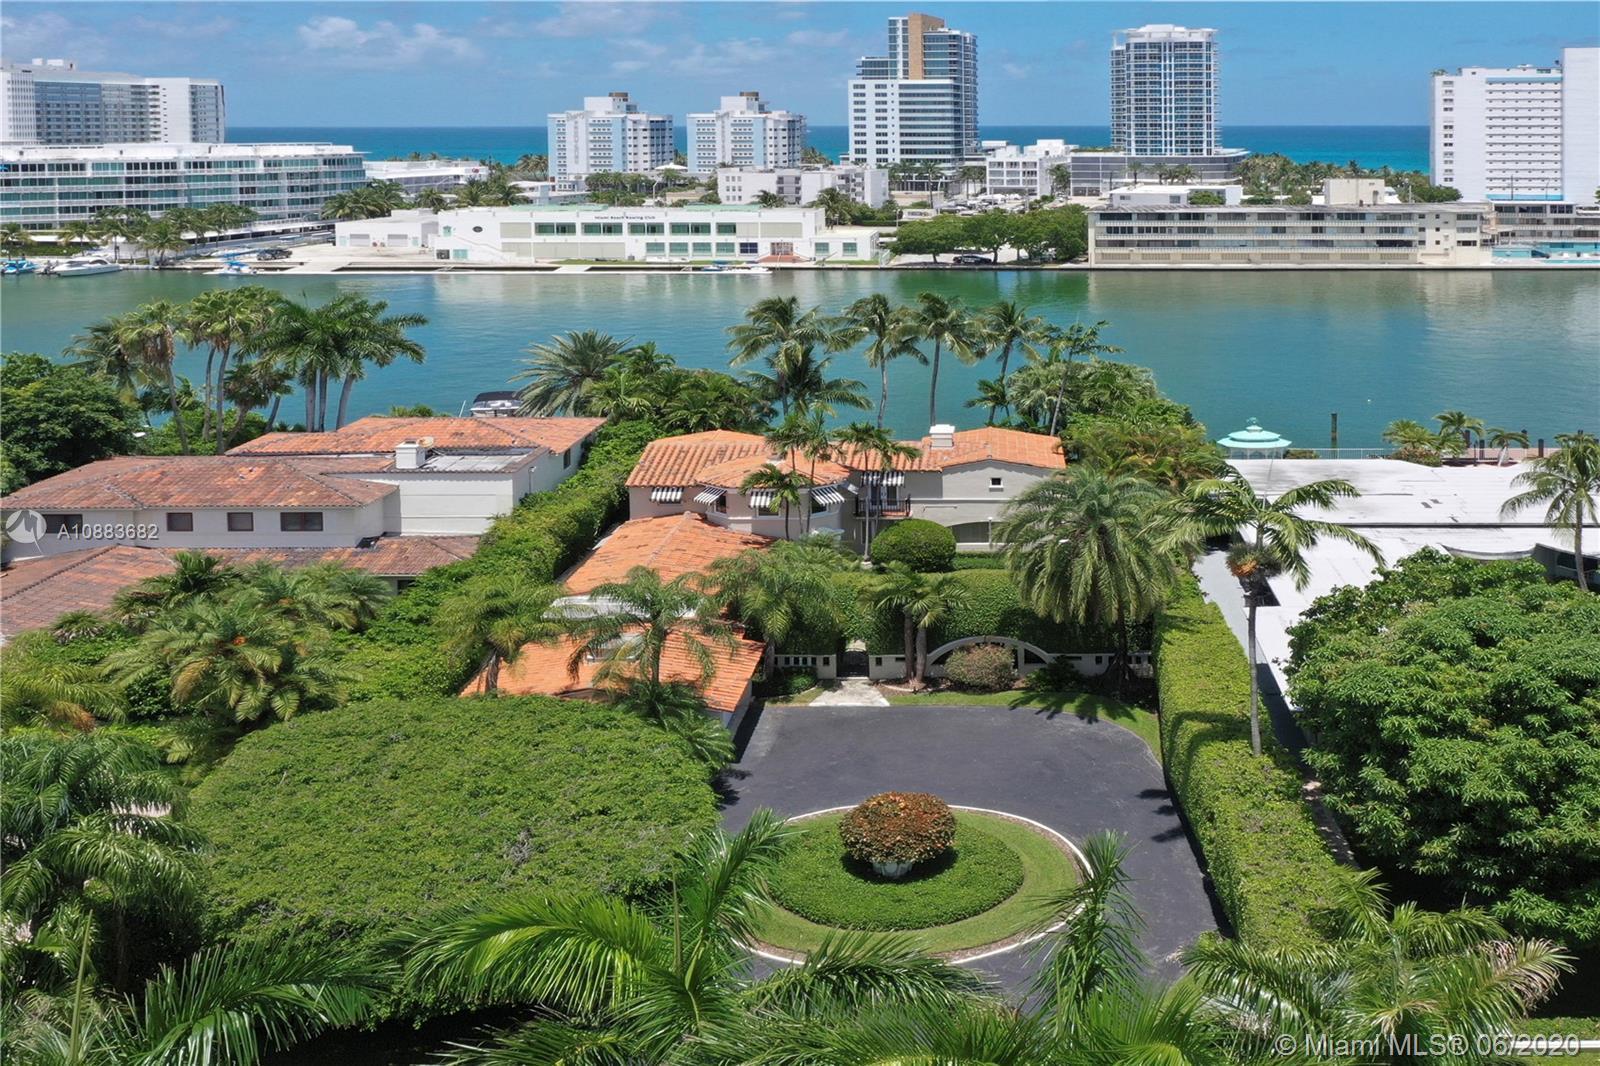 Exclusive Waterfront Estate on Allison Island. Allison Island is a prestigious Guard Gated Miami Bea